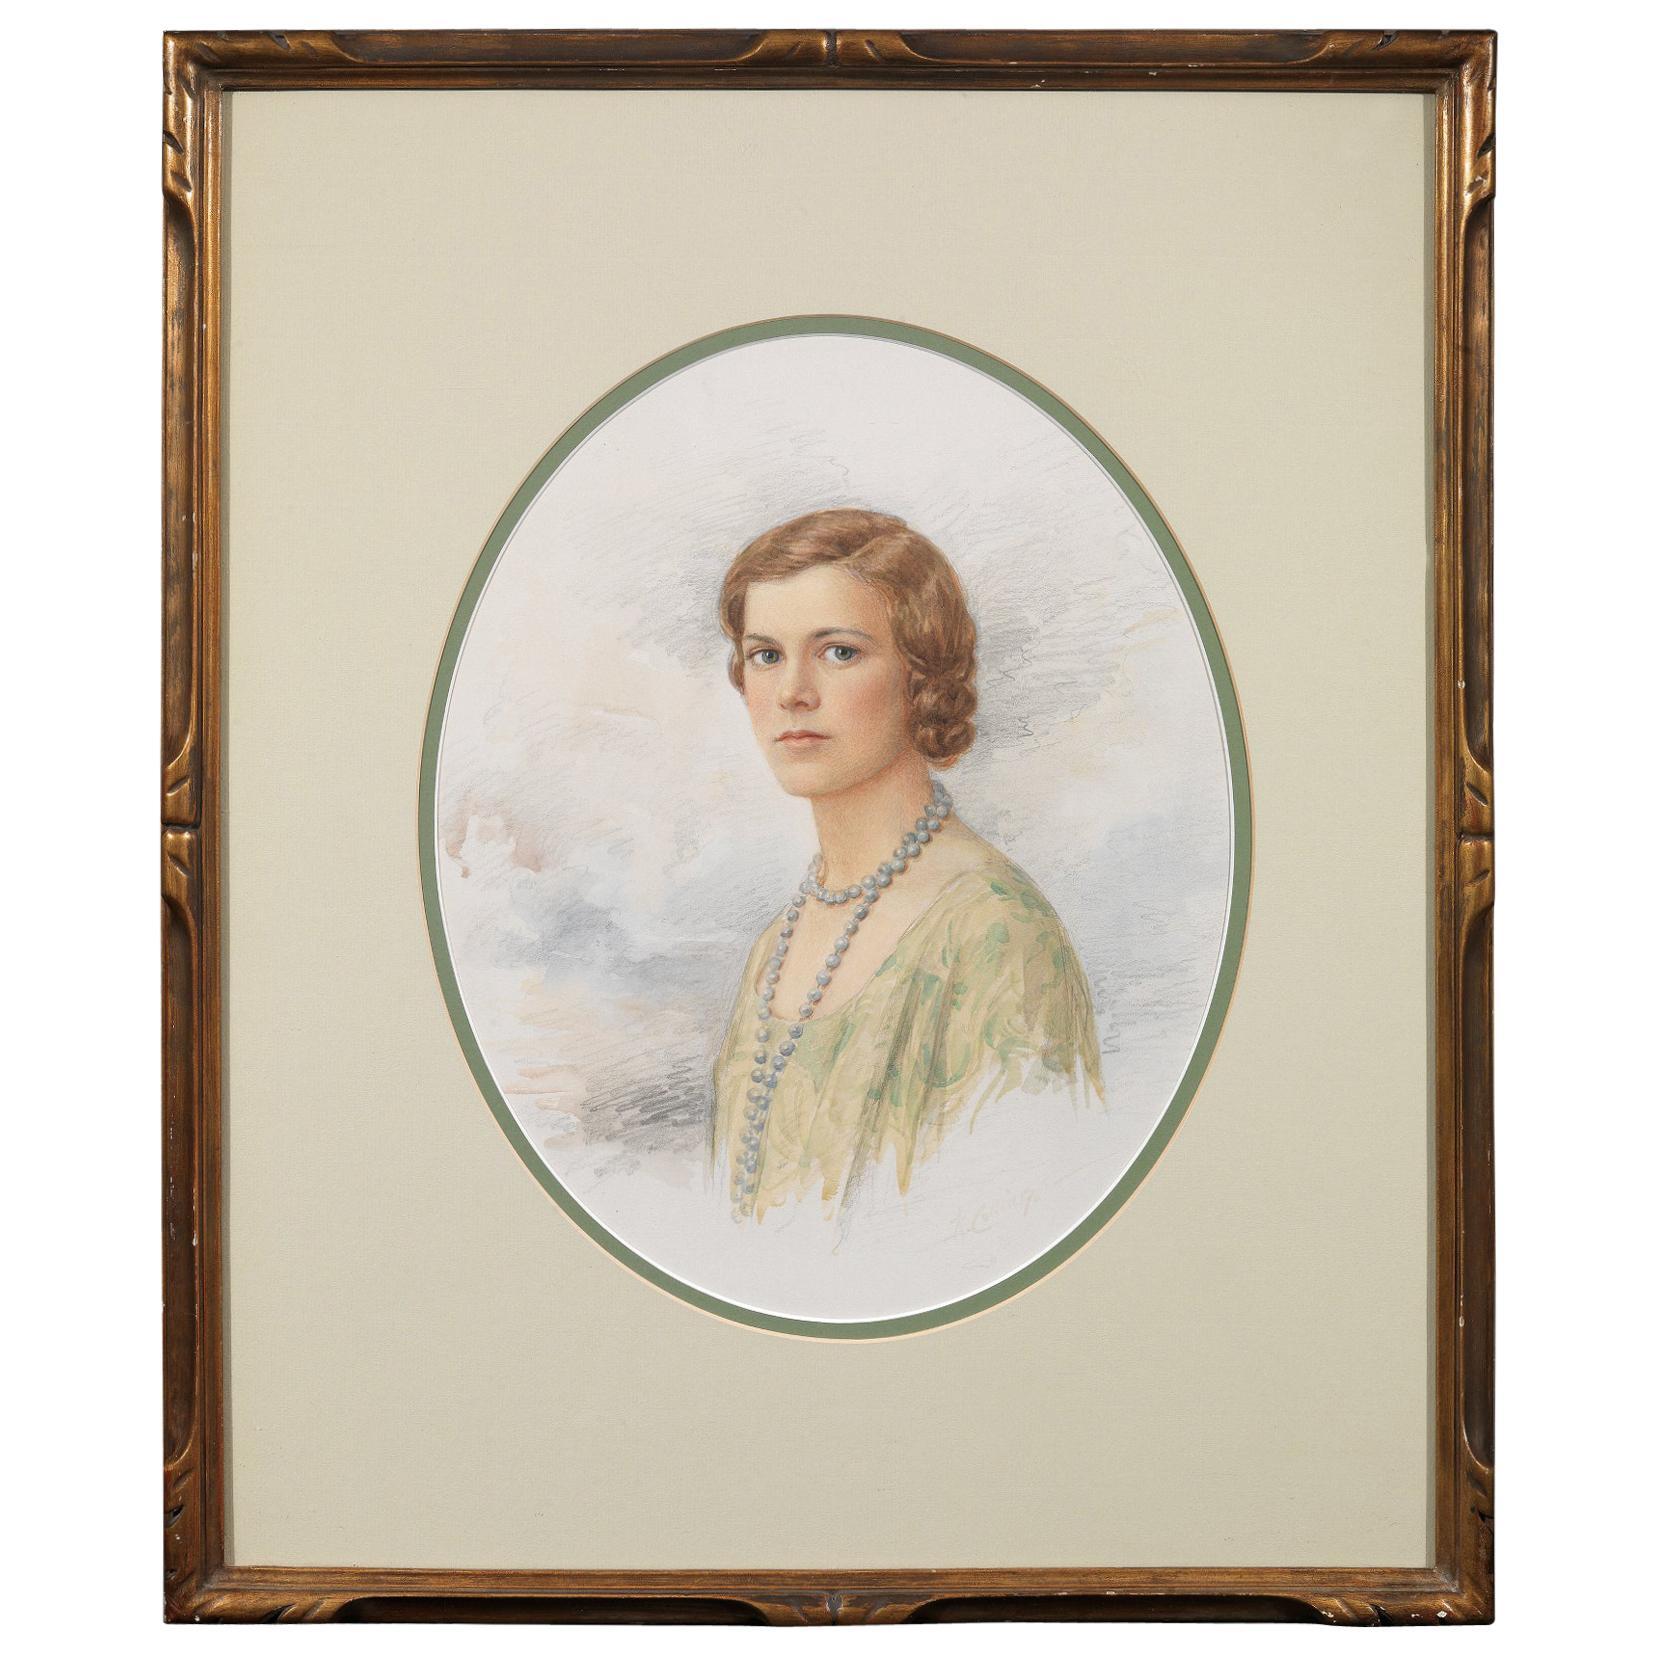 K. Collings Watercolour Portrait of a Lady